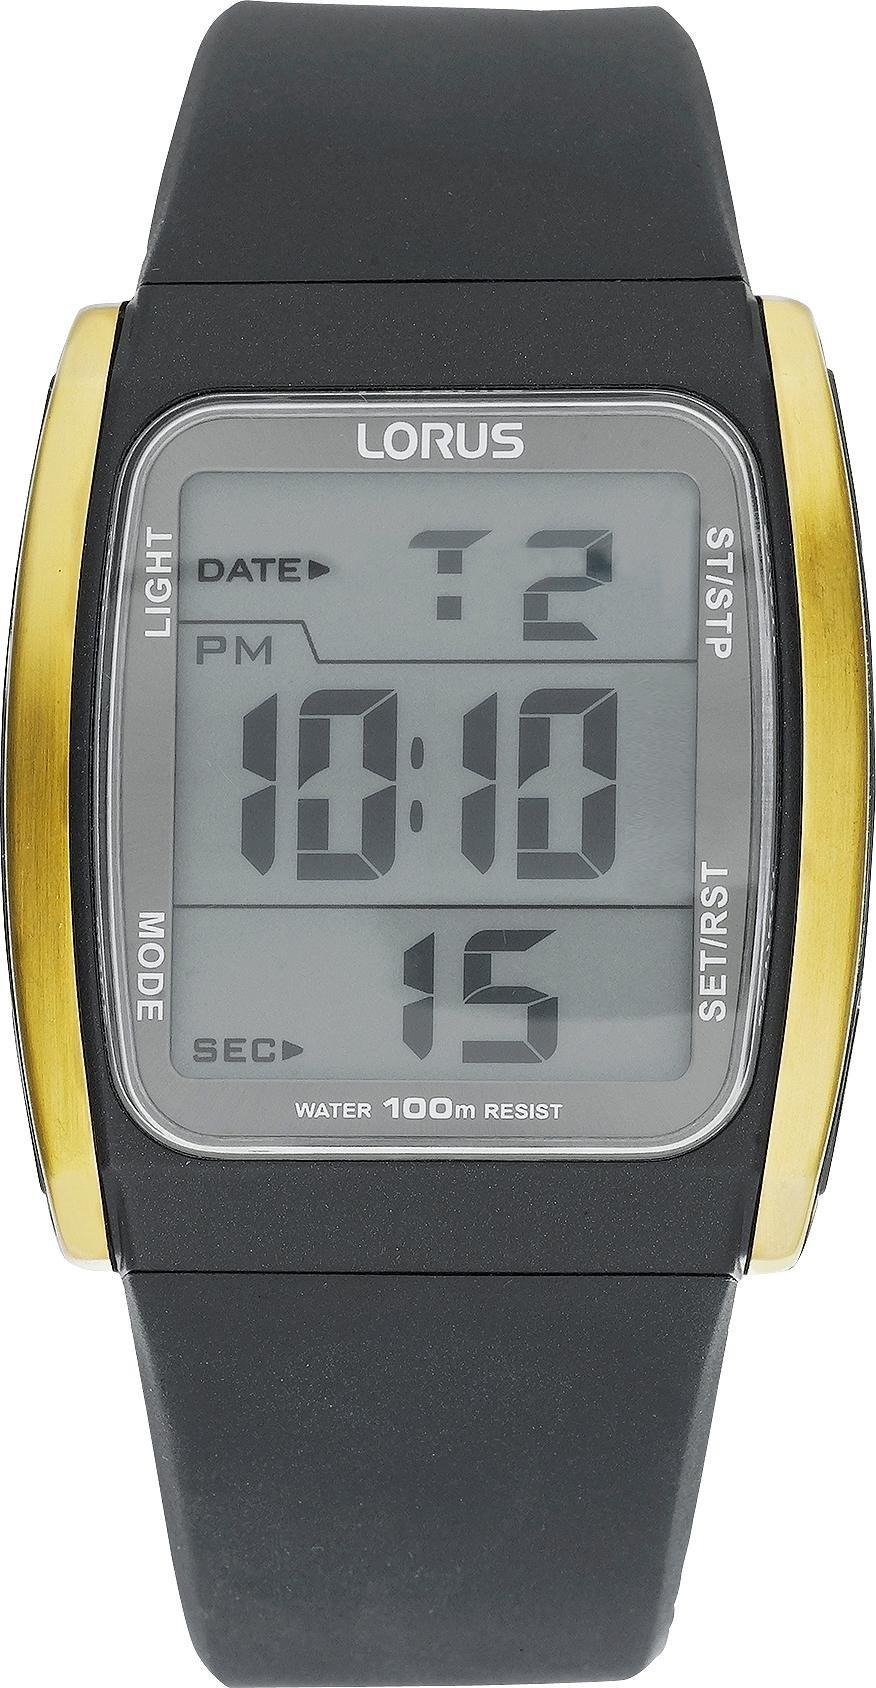 Lorus Men's Black Resin Strap Digital Watch